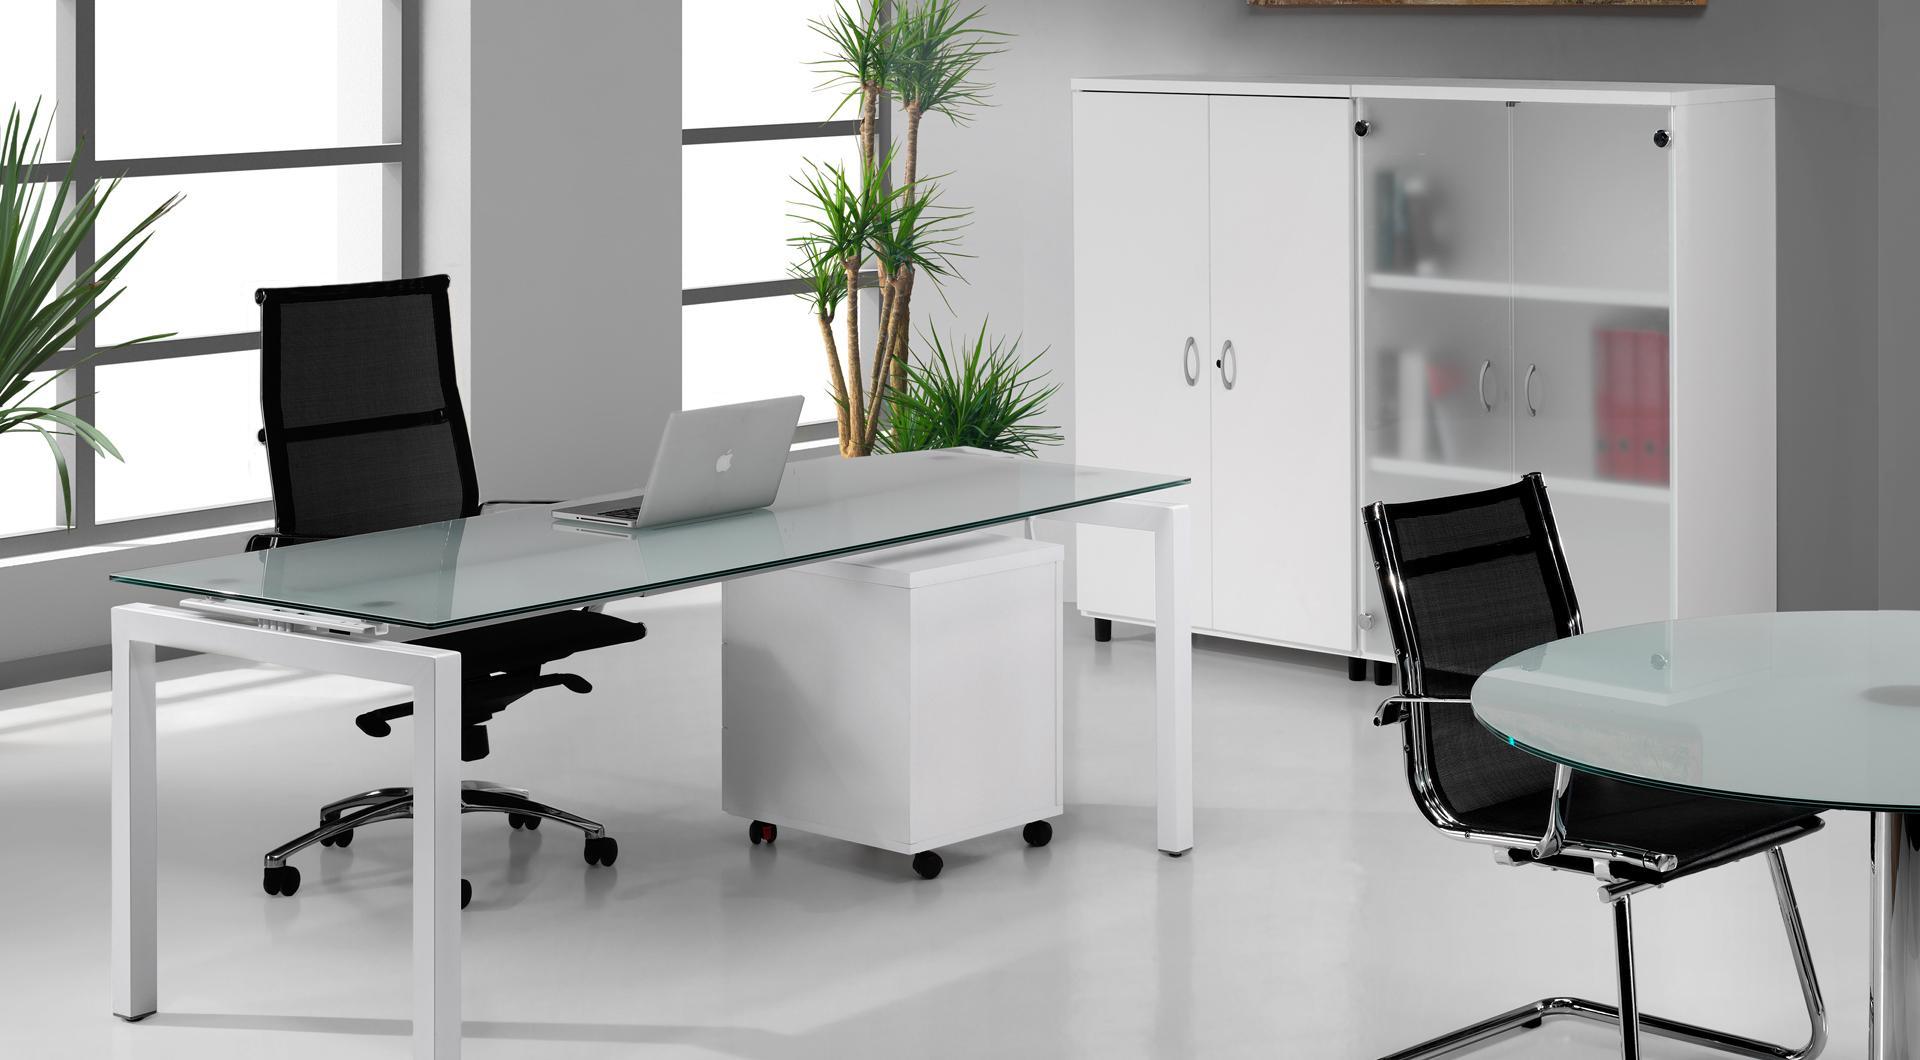 Muebles Oficina Online Baratos | Muebles Oficina Monterrey Obtenga ...